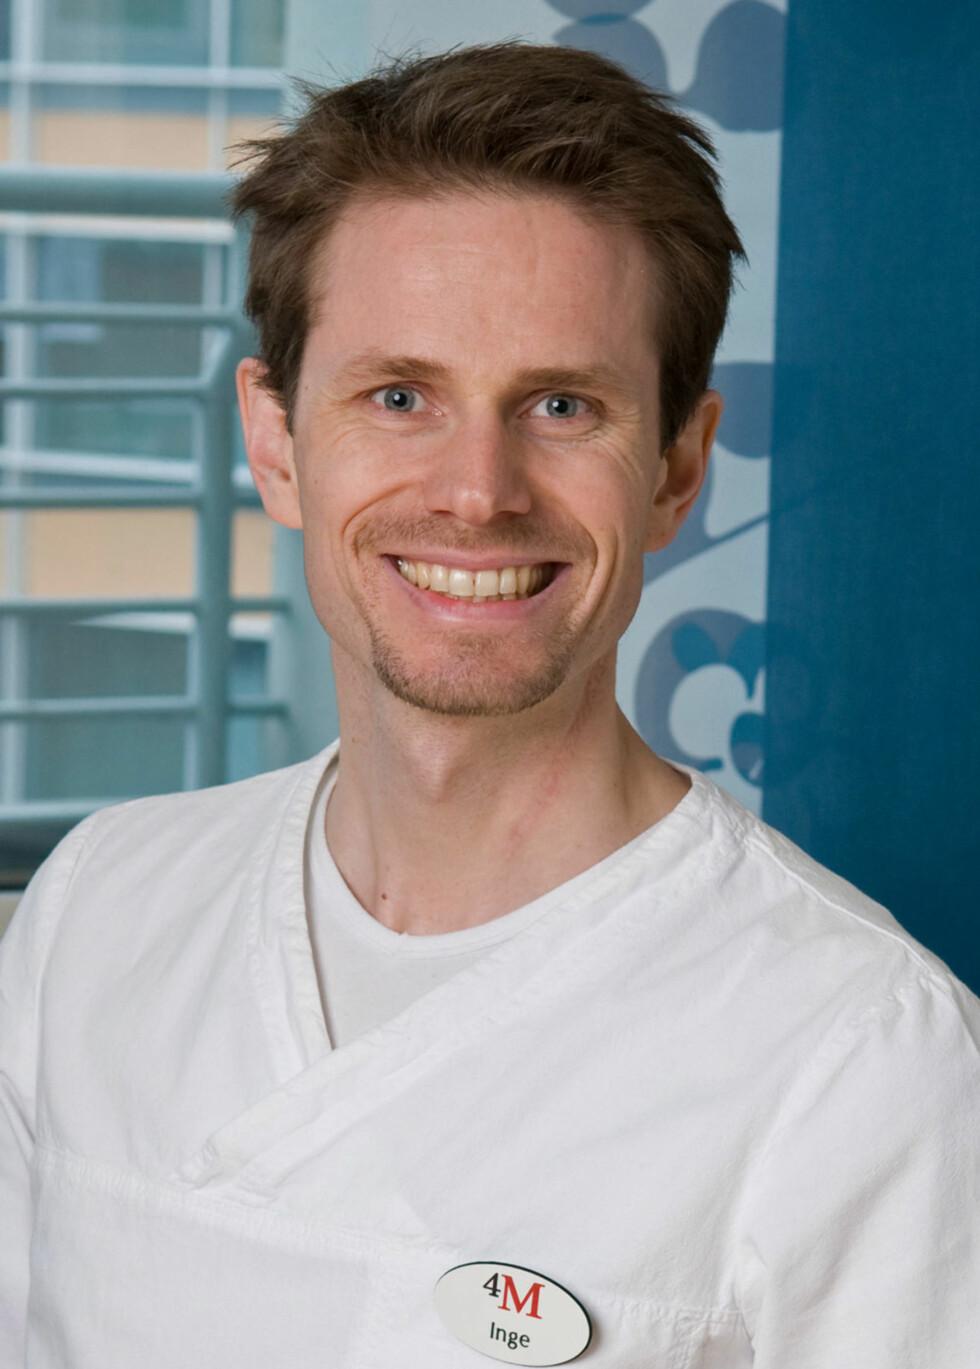 Klinisk ernæringsfysiolog Inge Lindseth ved 4M-klinikken/Balderklinikken